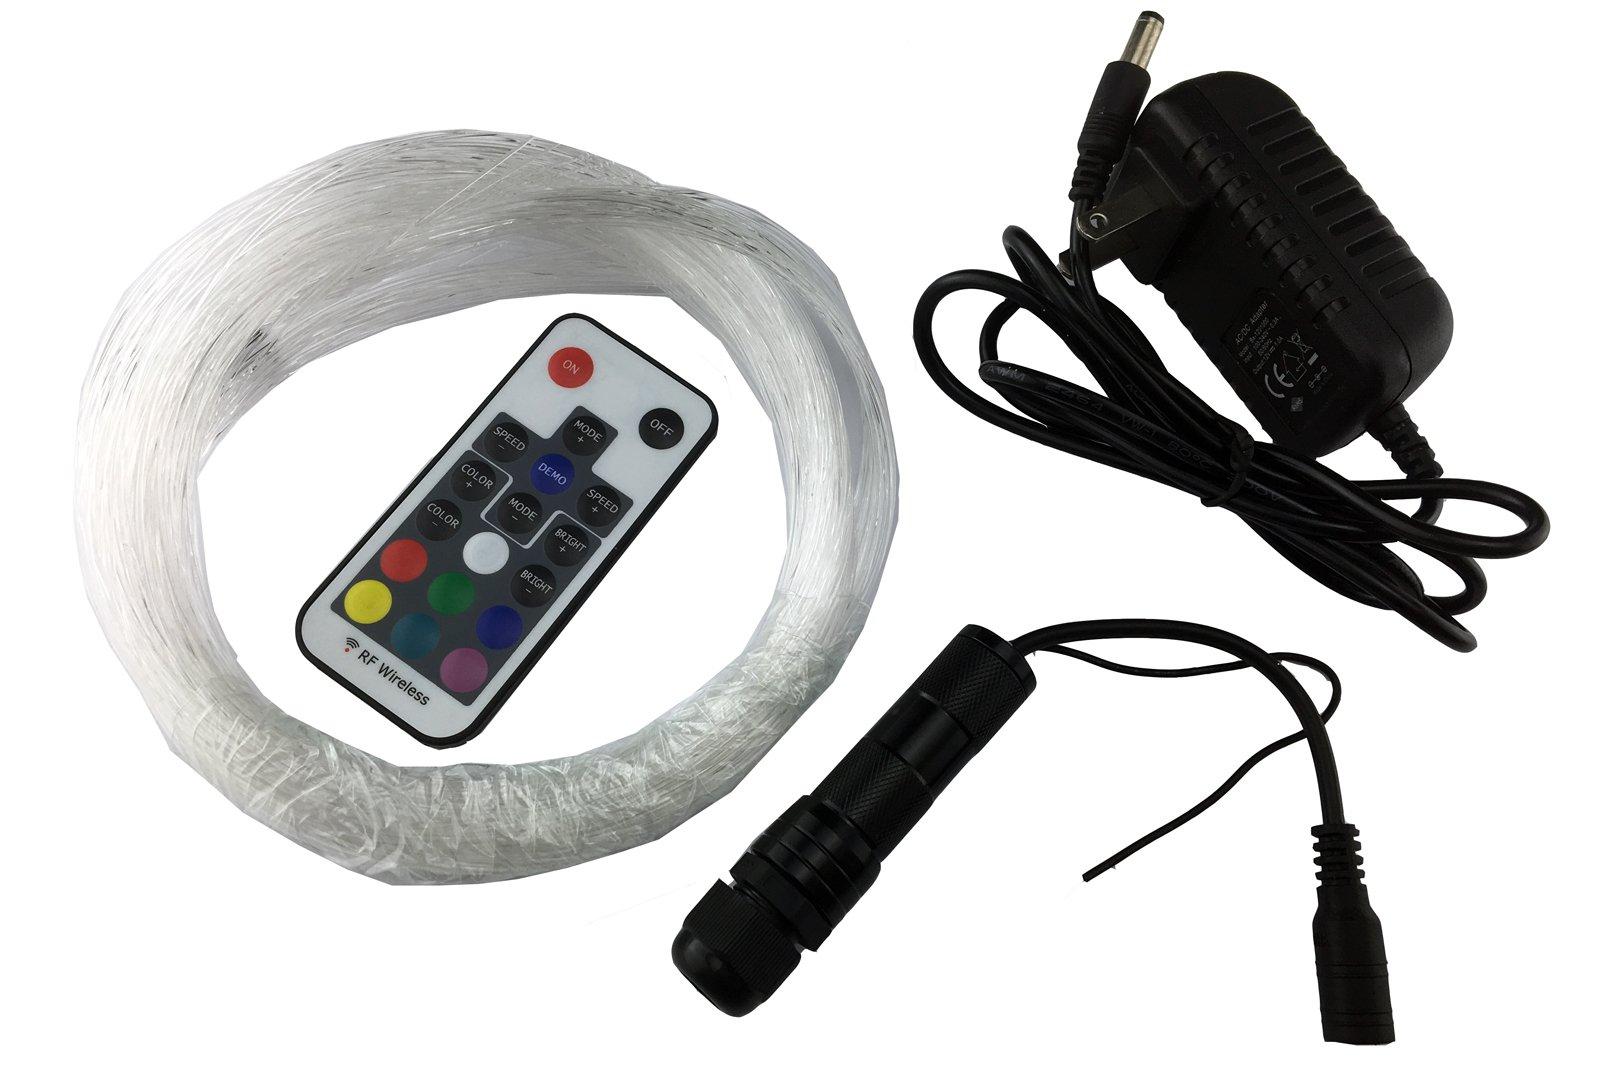 corpereal Diy 12V Multi Color Led Fiber Optic Light Kit For Indoor Home Car Ceiling Wall Lighting Decorations